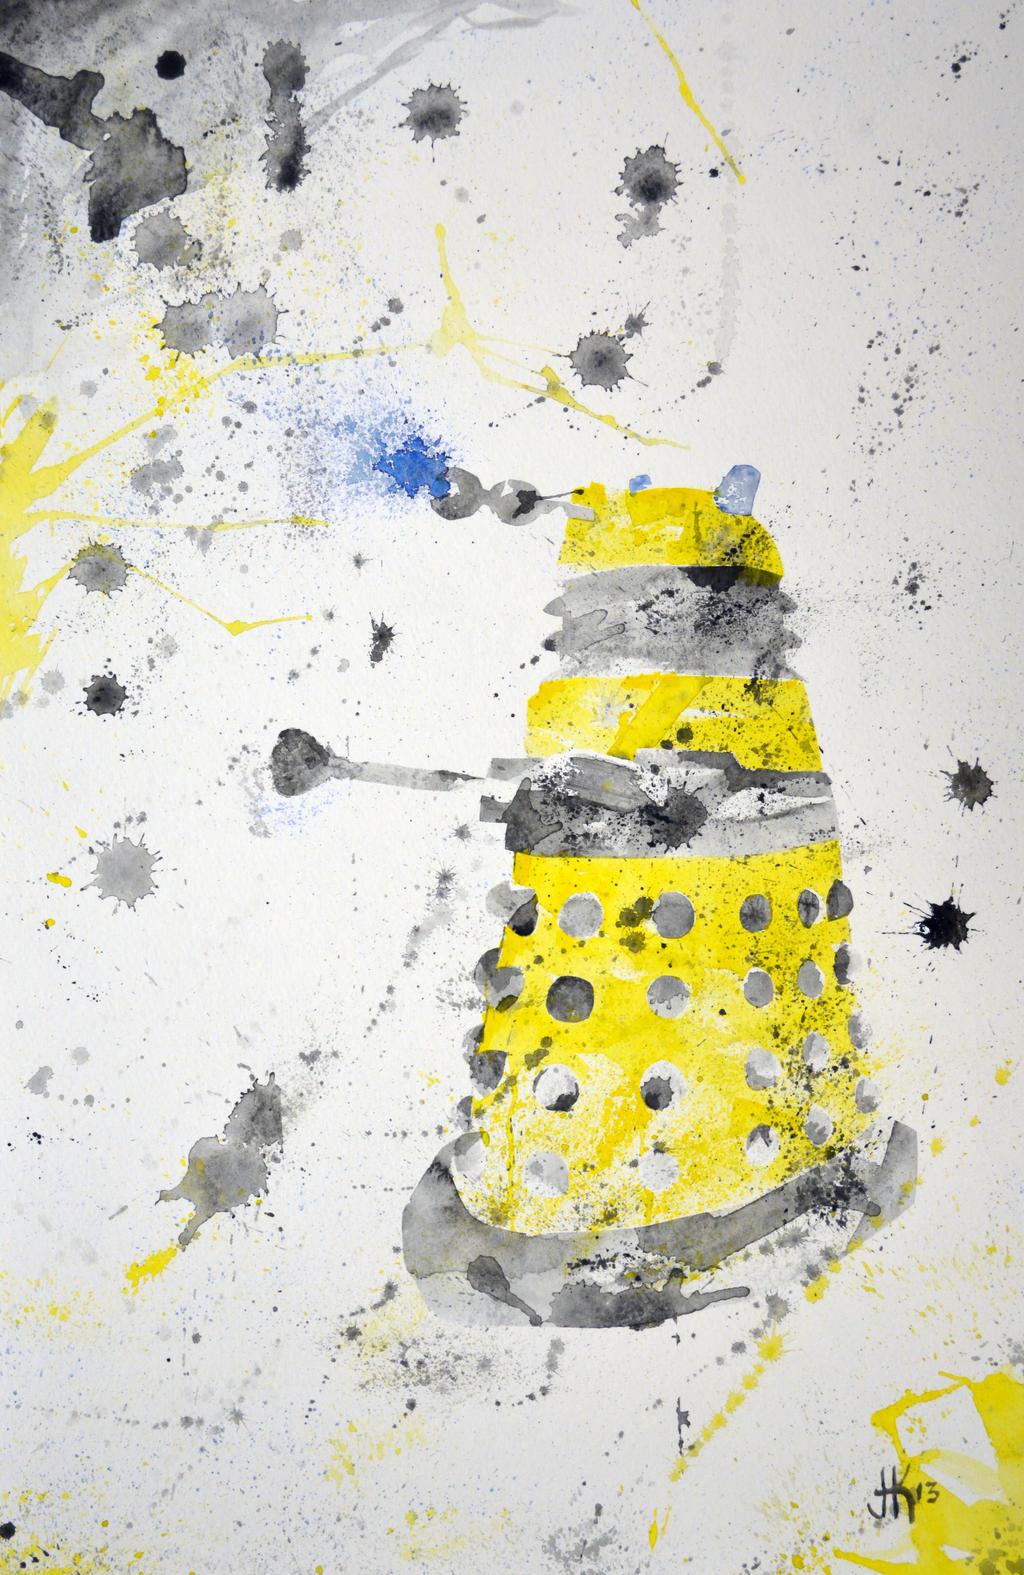 Dalek- Doctor Who